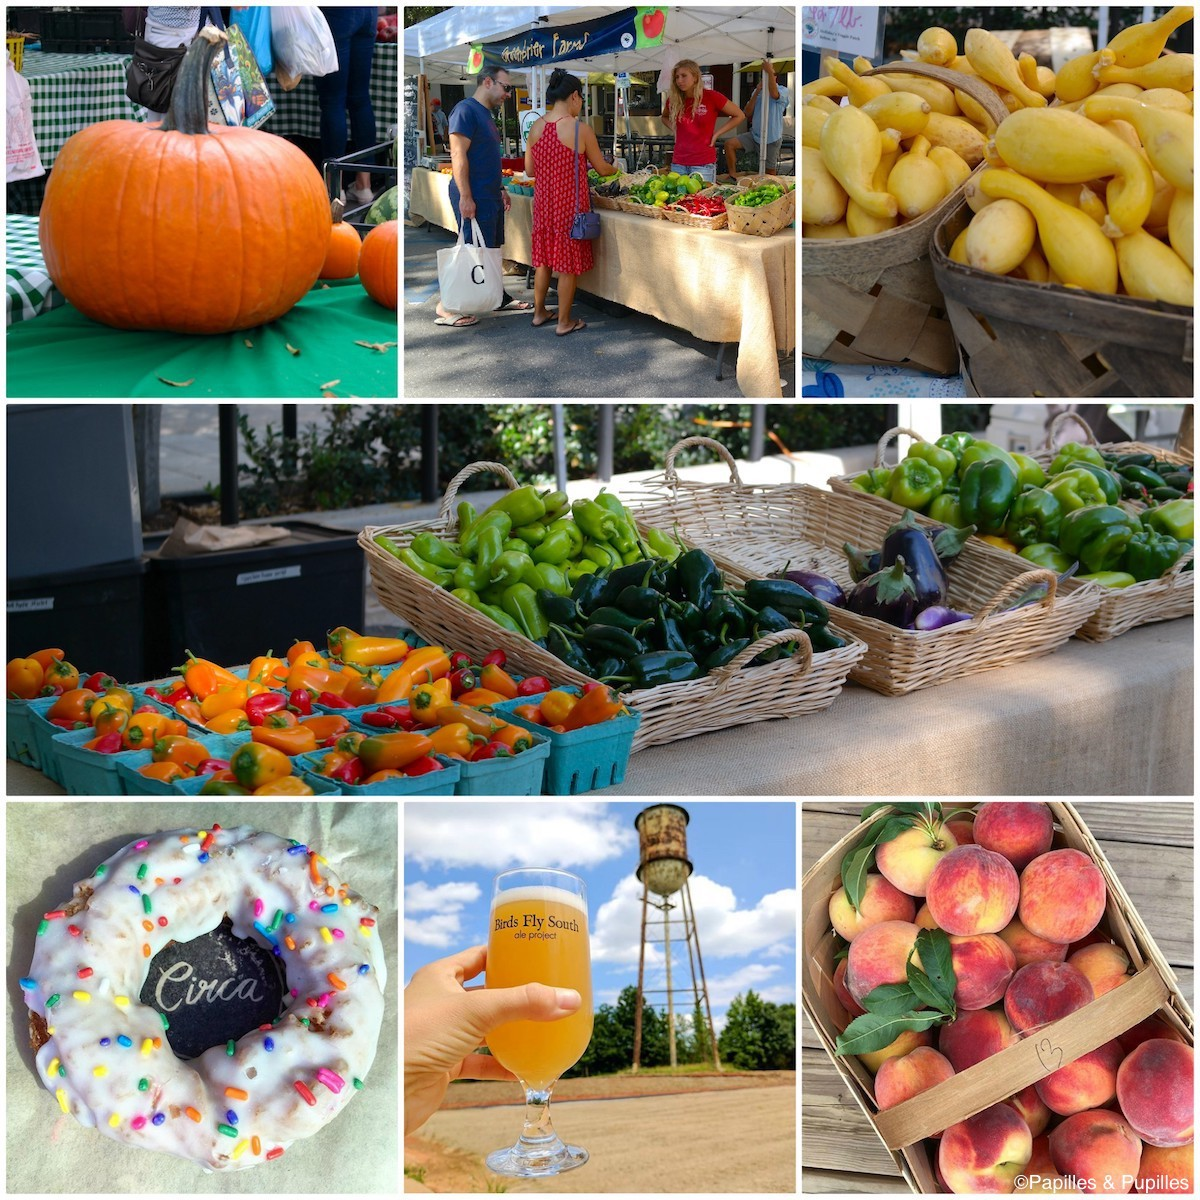 Greenville - Le marché du samedi matin